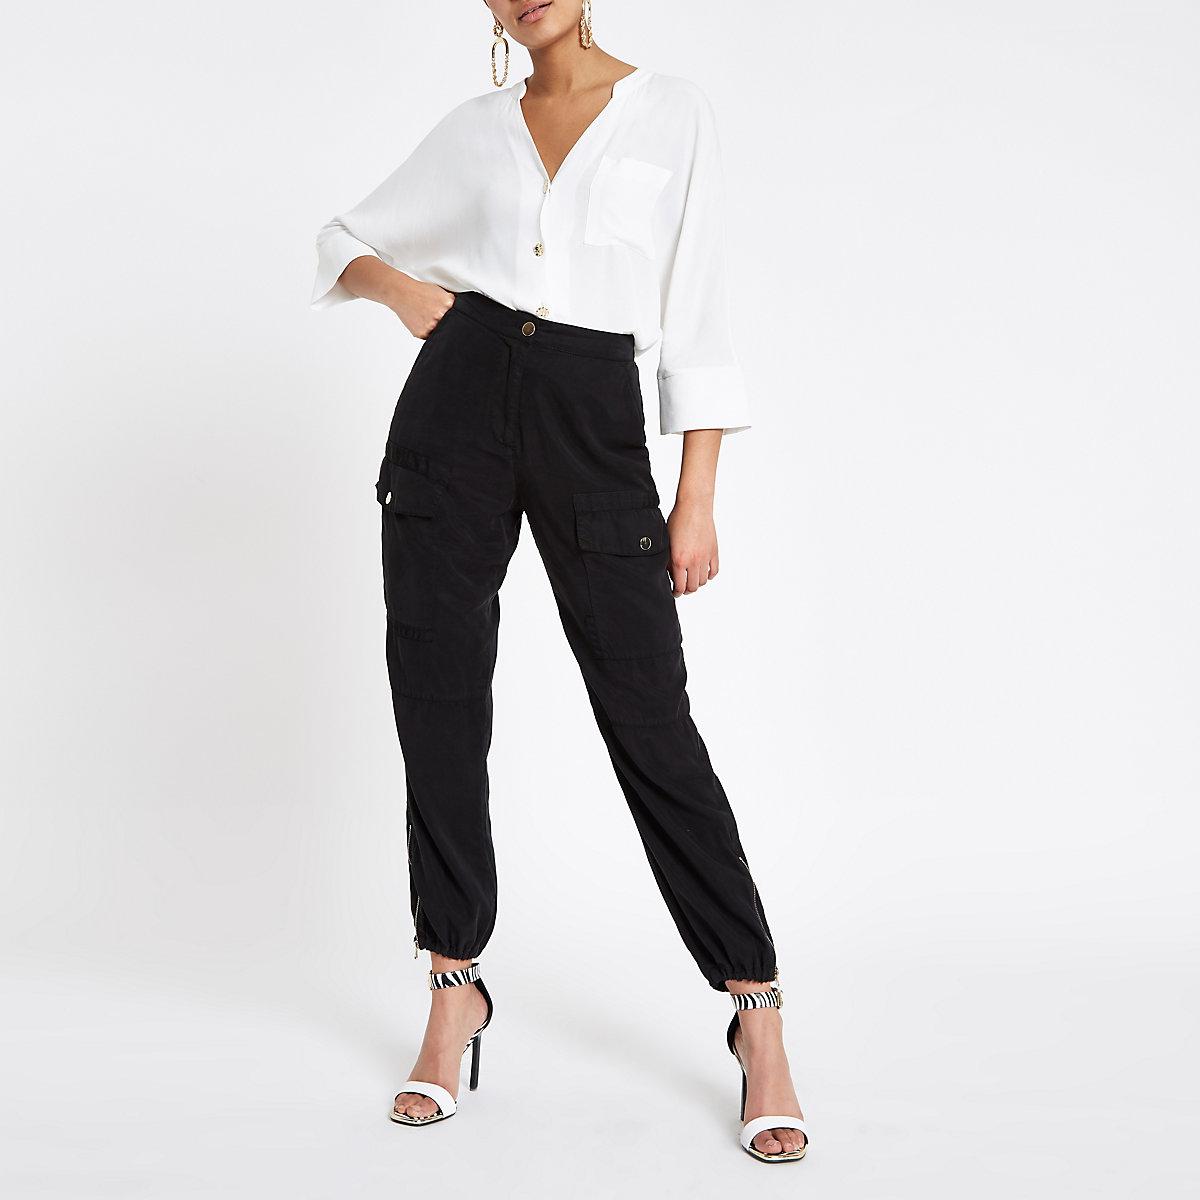 White button up v neck blouse